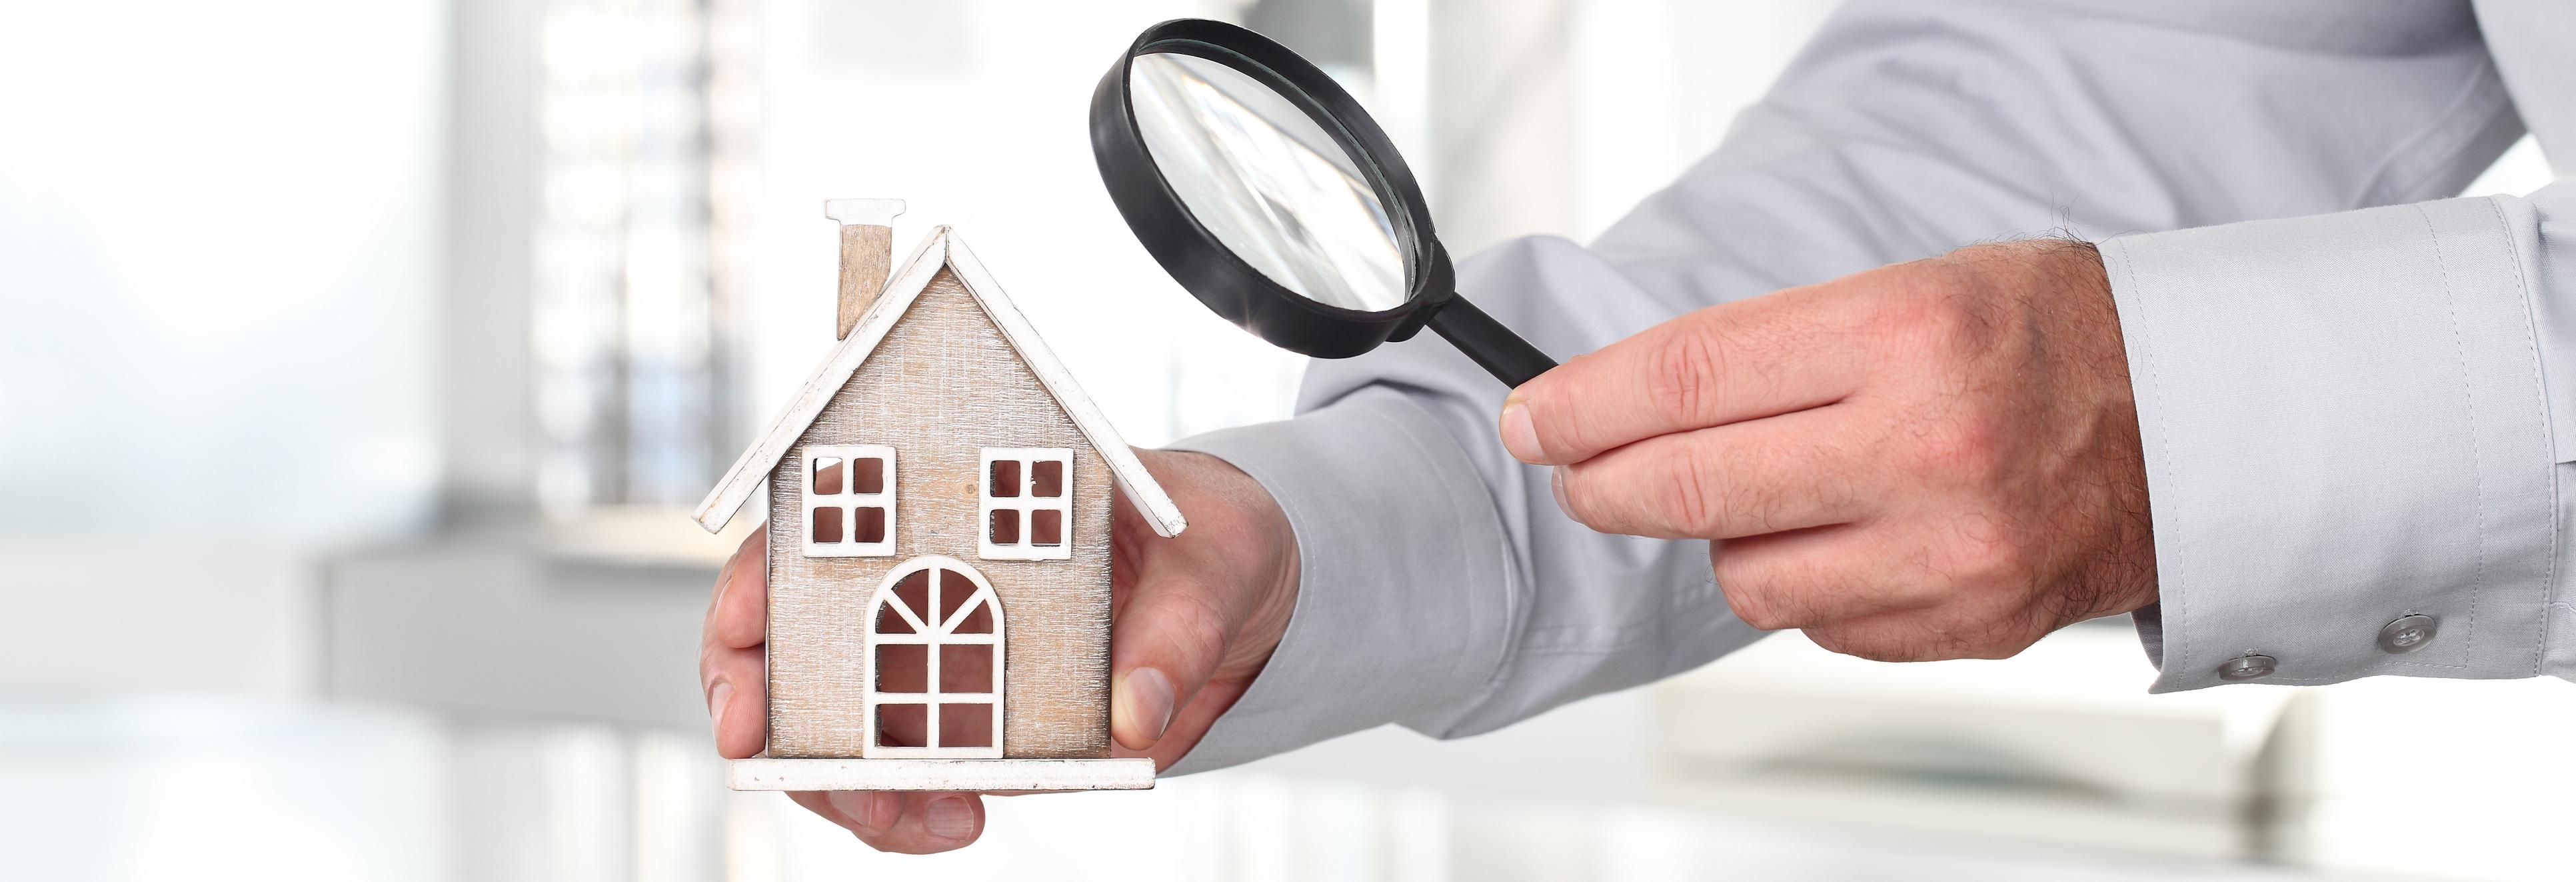 gerard home inspection real estate radon insect damage cincinnati ohio